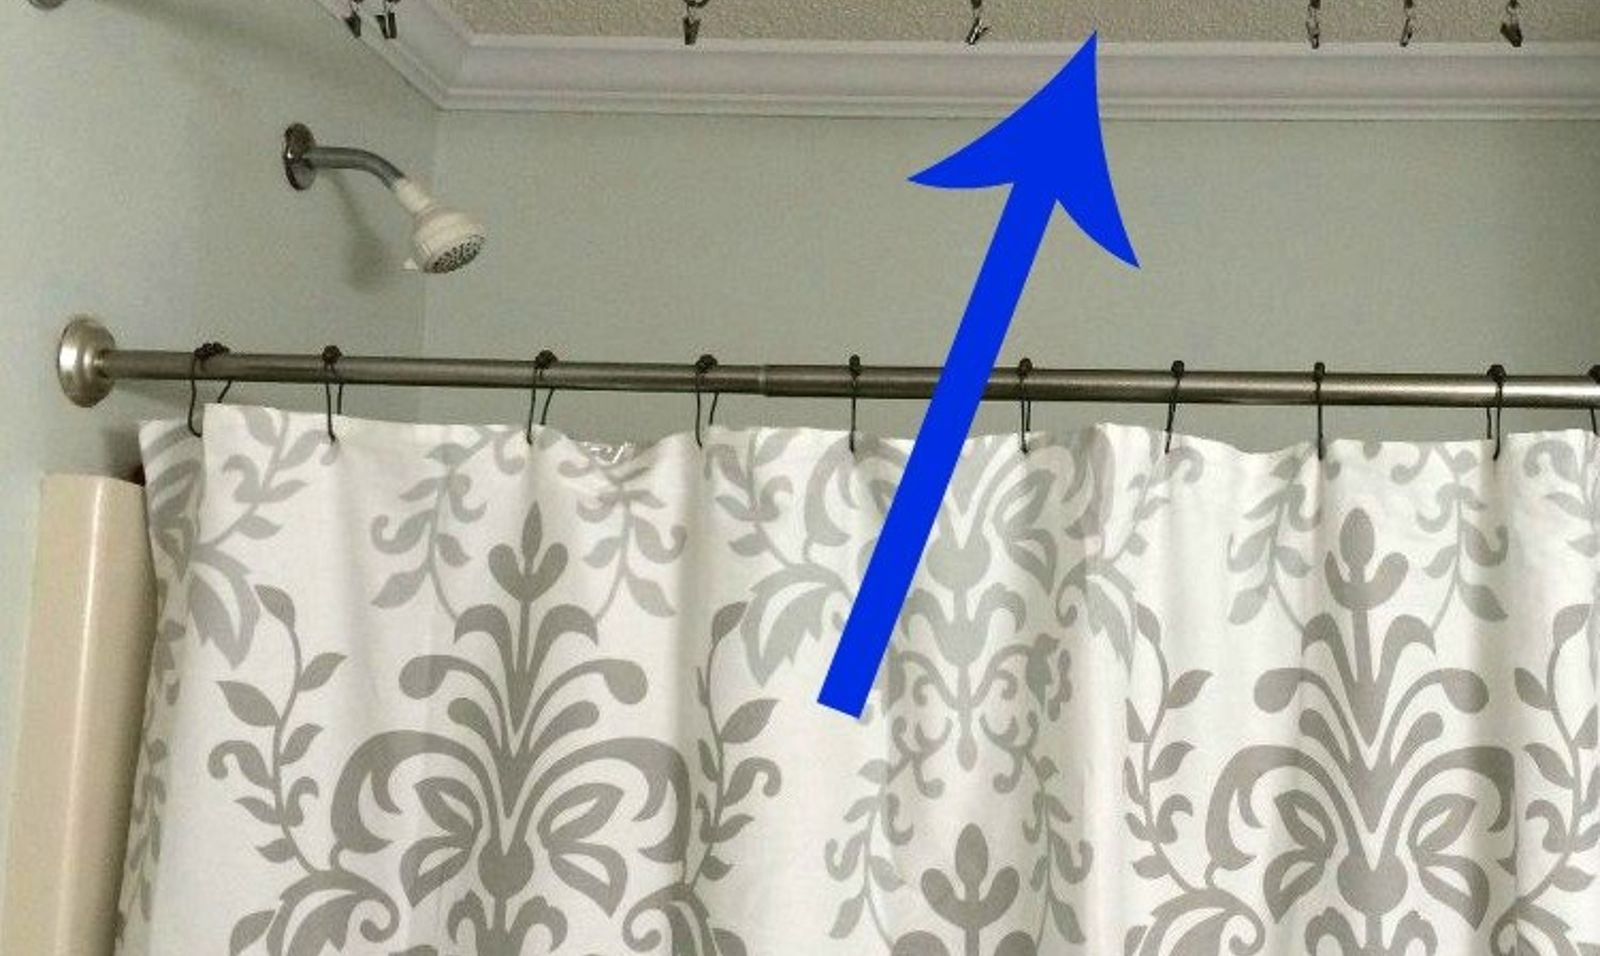 shower curtain rod ideas. Start Shower Curtain Rod Ideas C